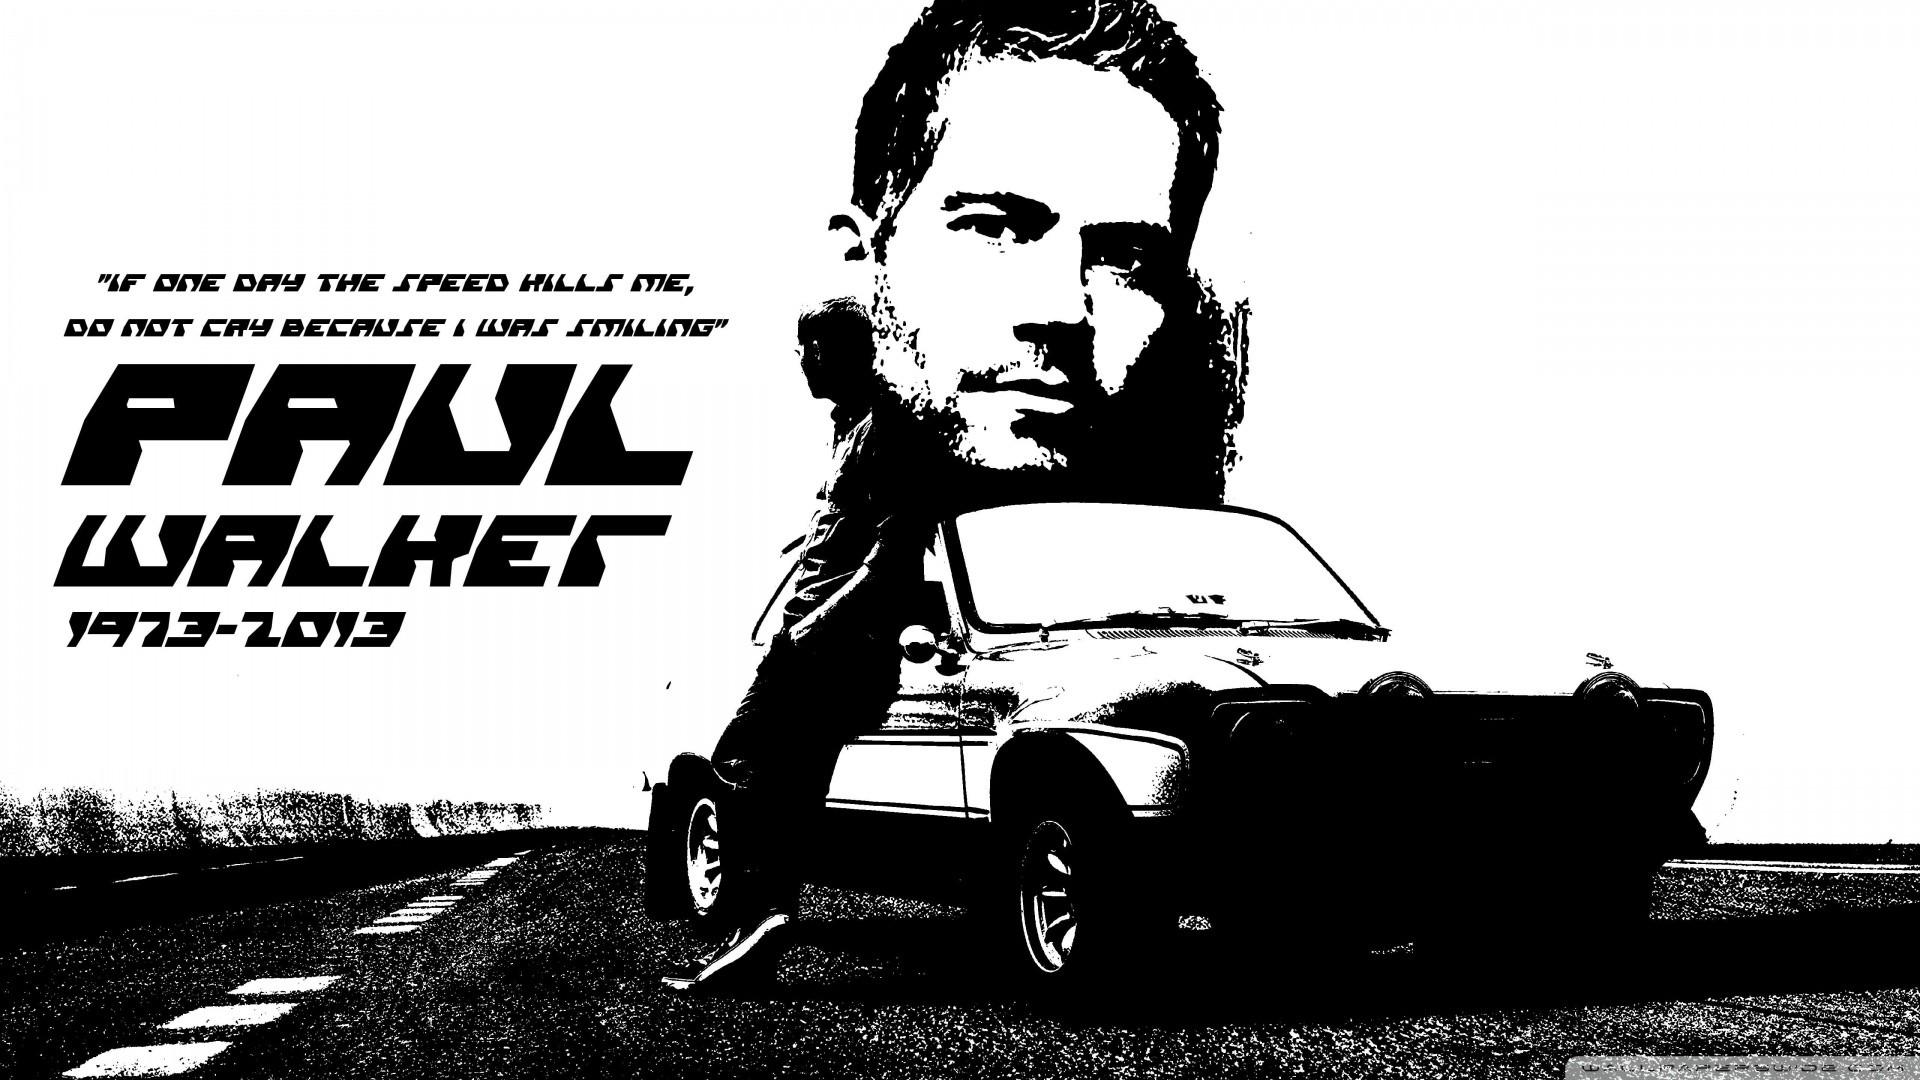 Fast & Furious 6 (2013) Phone Wallpaper in 2020 | Fast ... |Fast And Furious 6 Paul Walker Wallpaper